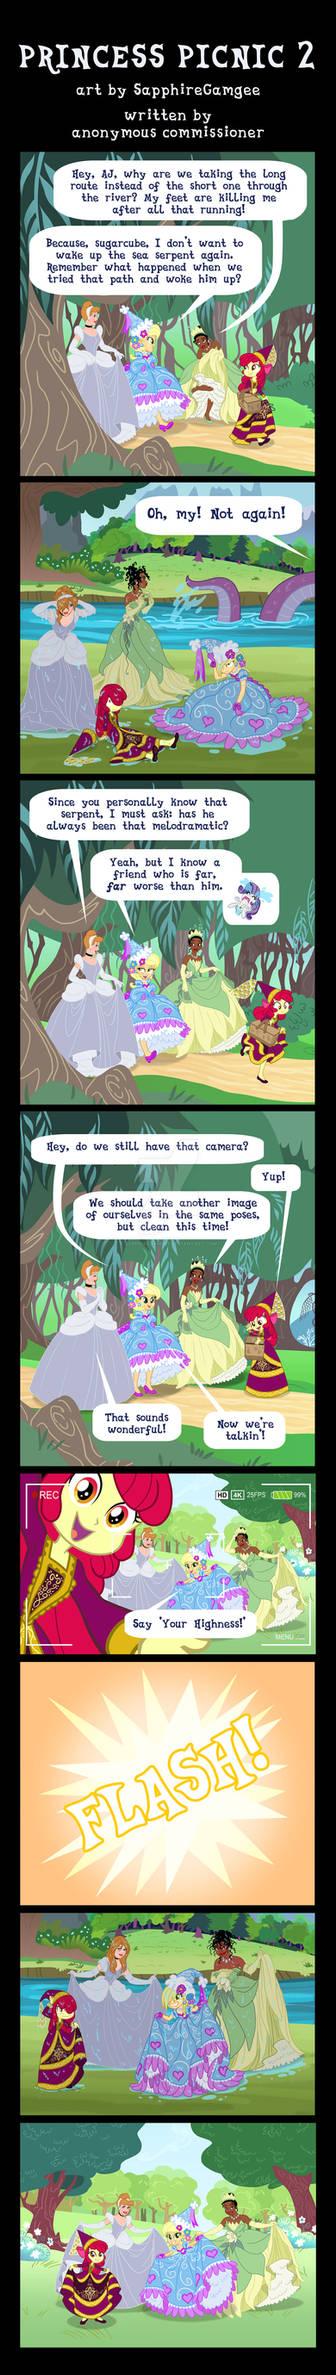 Commission: Princess Picnic 2